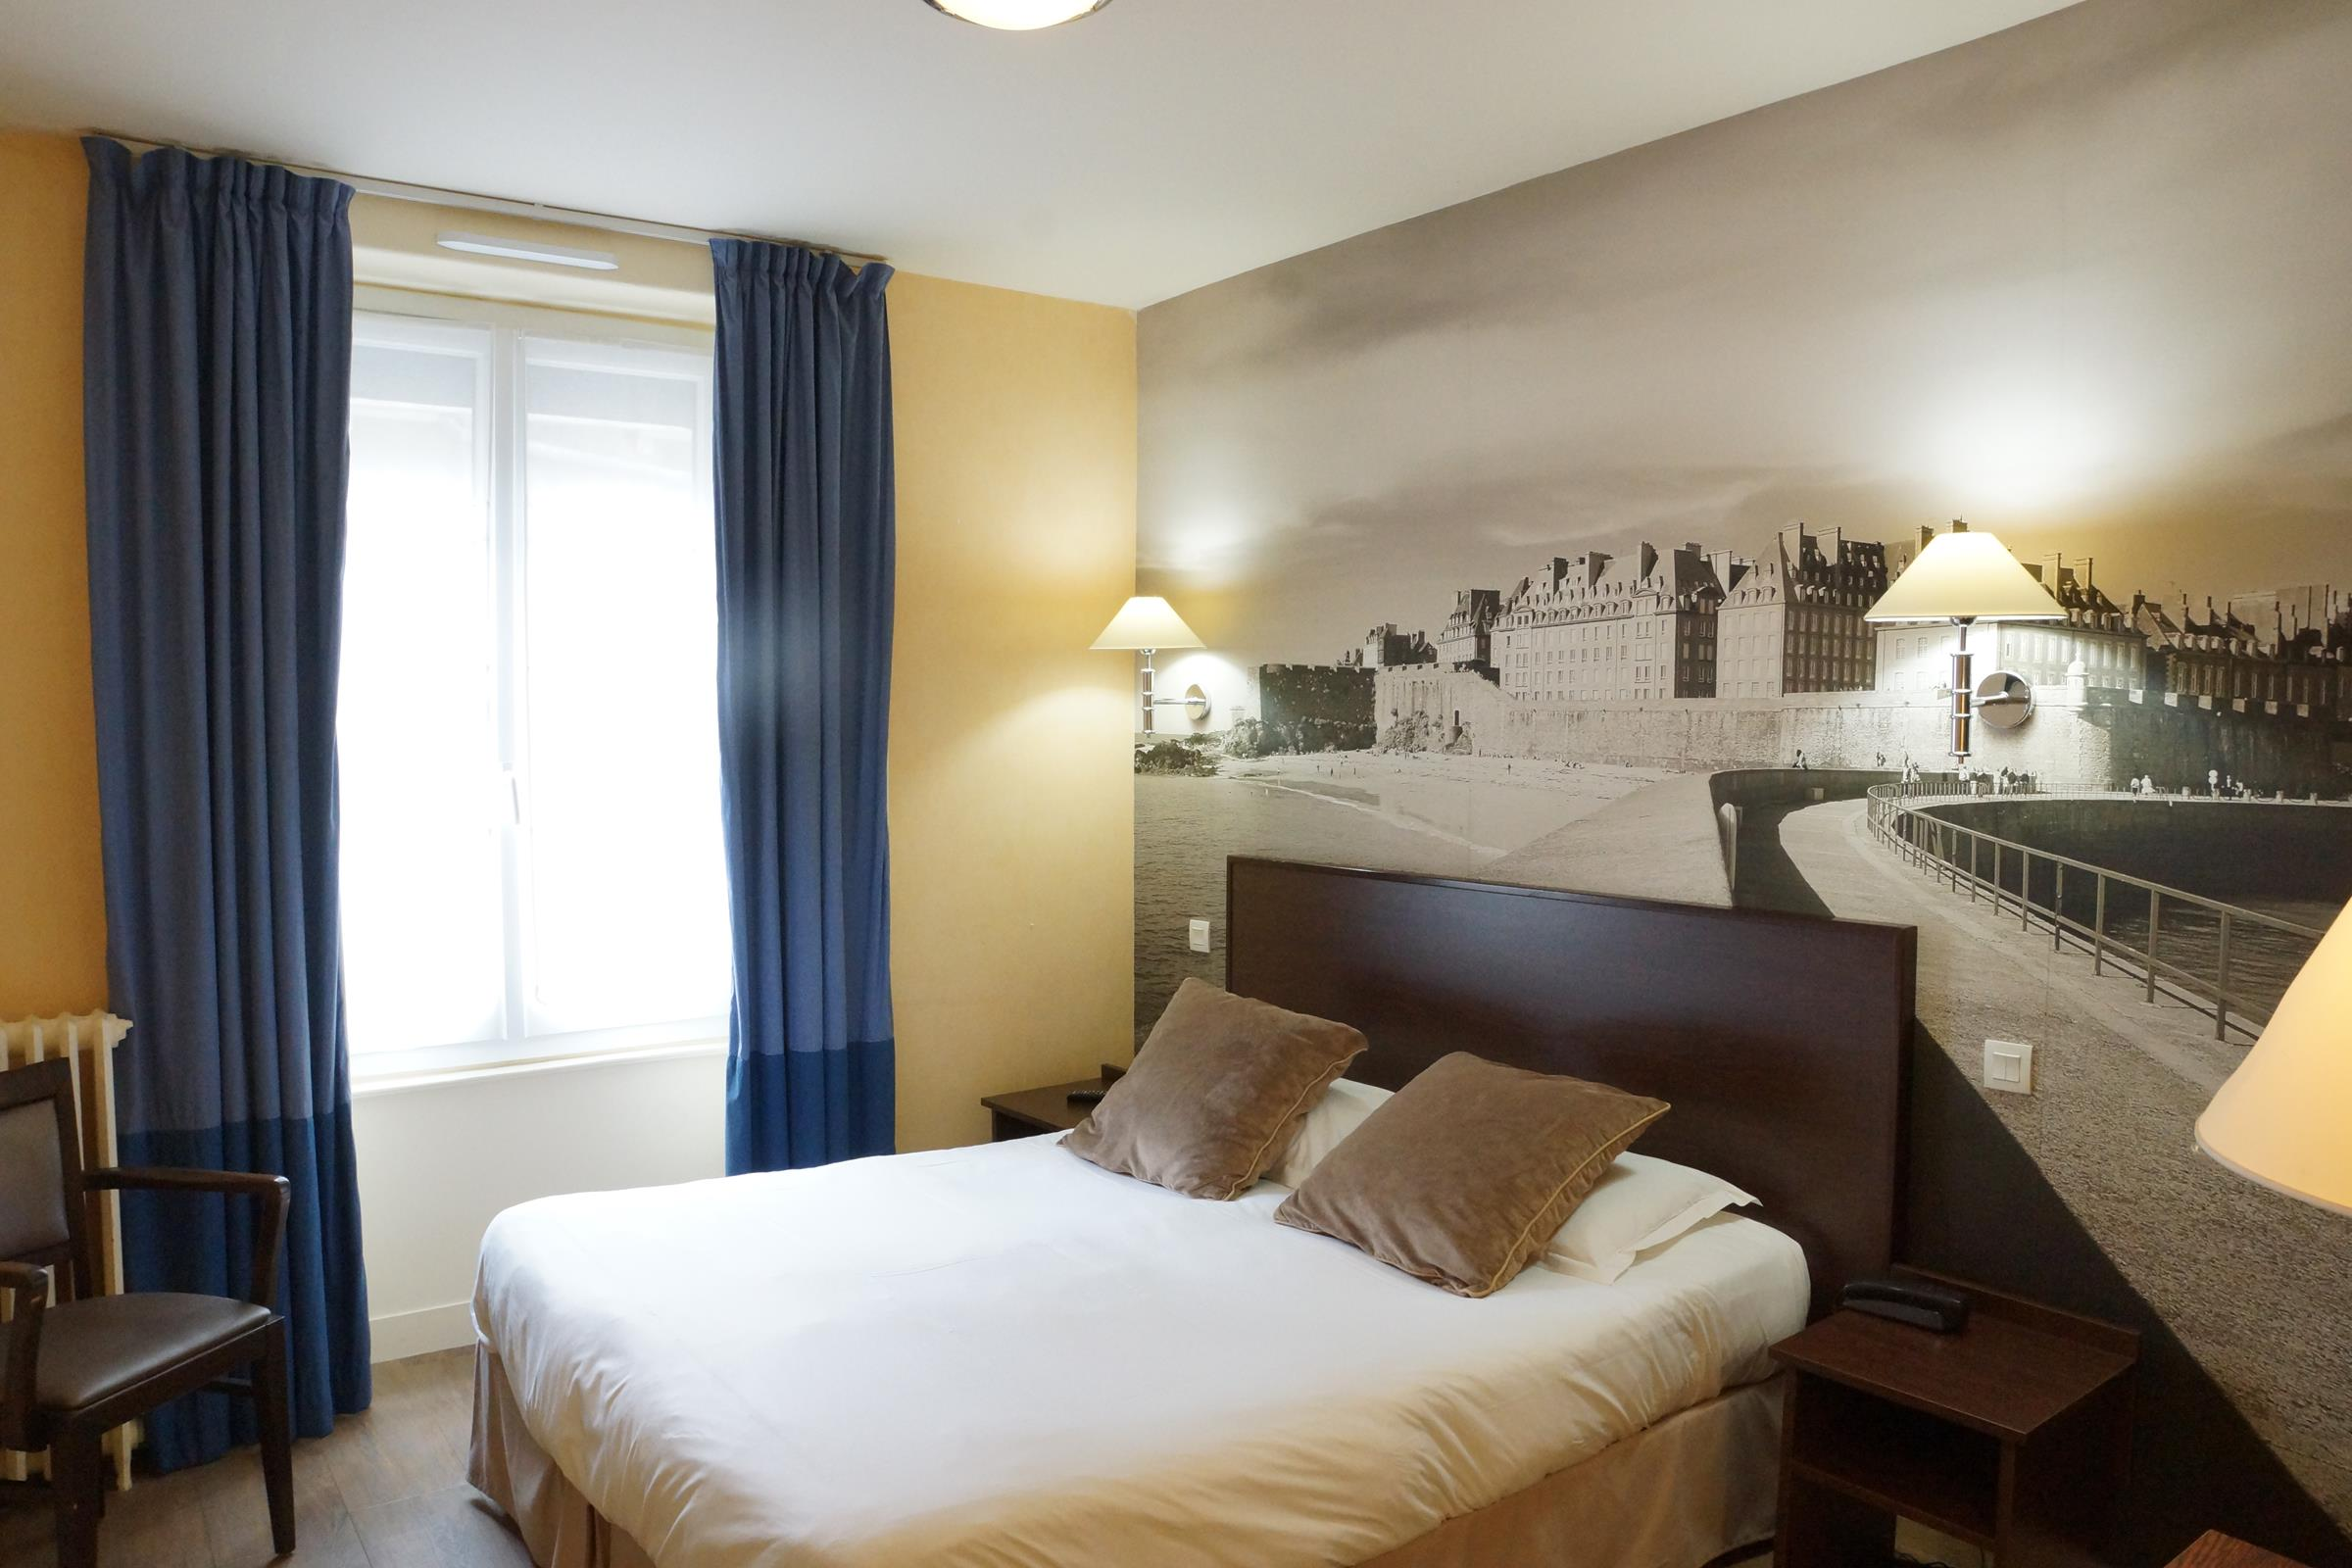 Chambre INTER-HOTEL Saint-Malo du Louvre à ST MALO